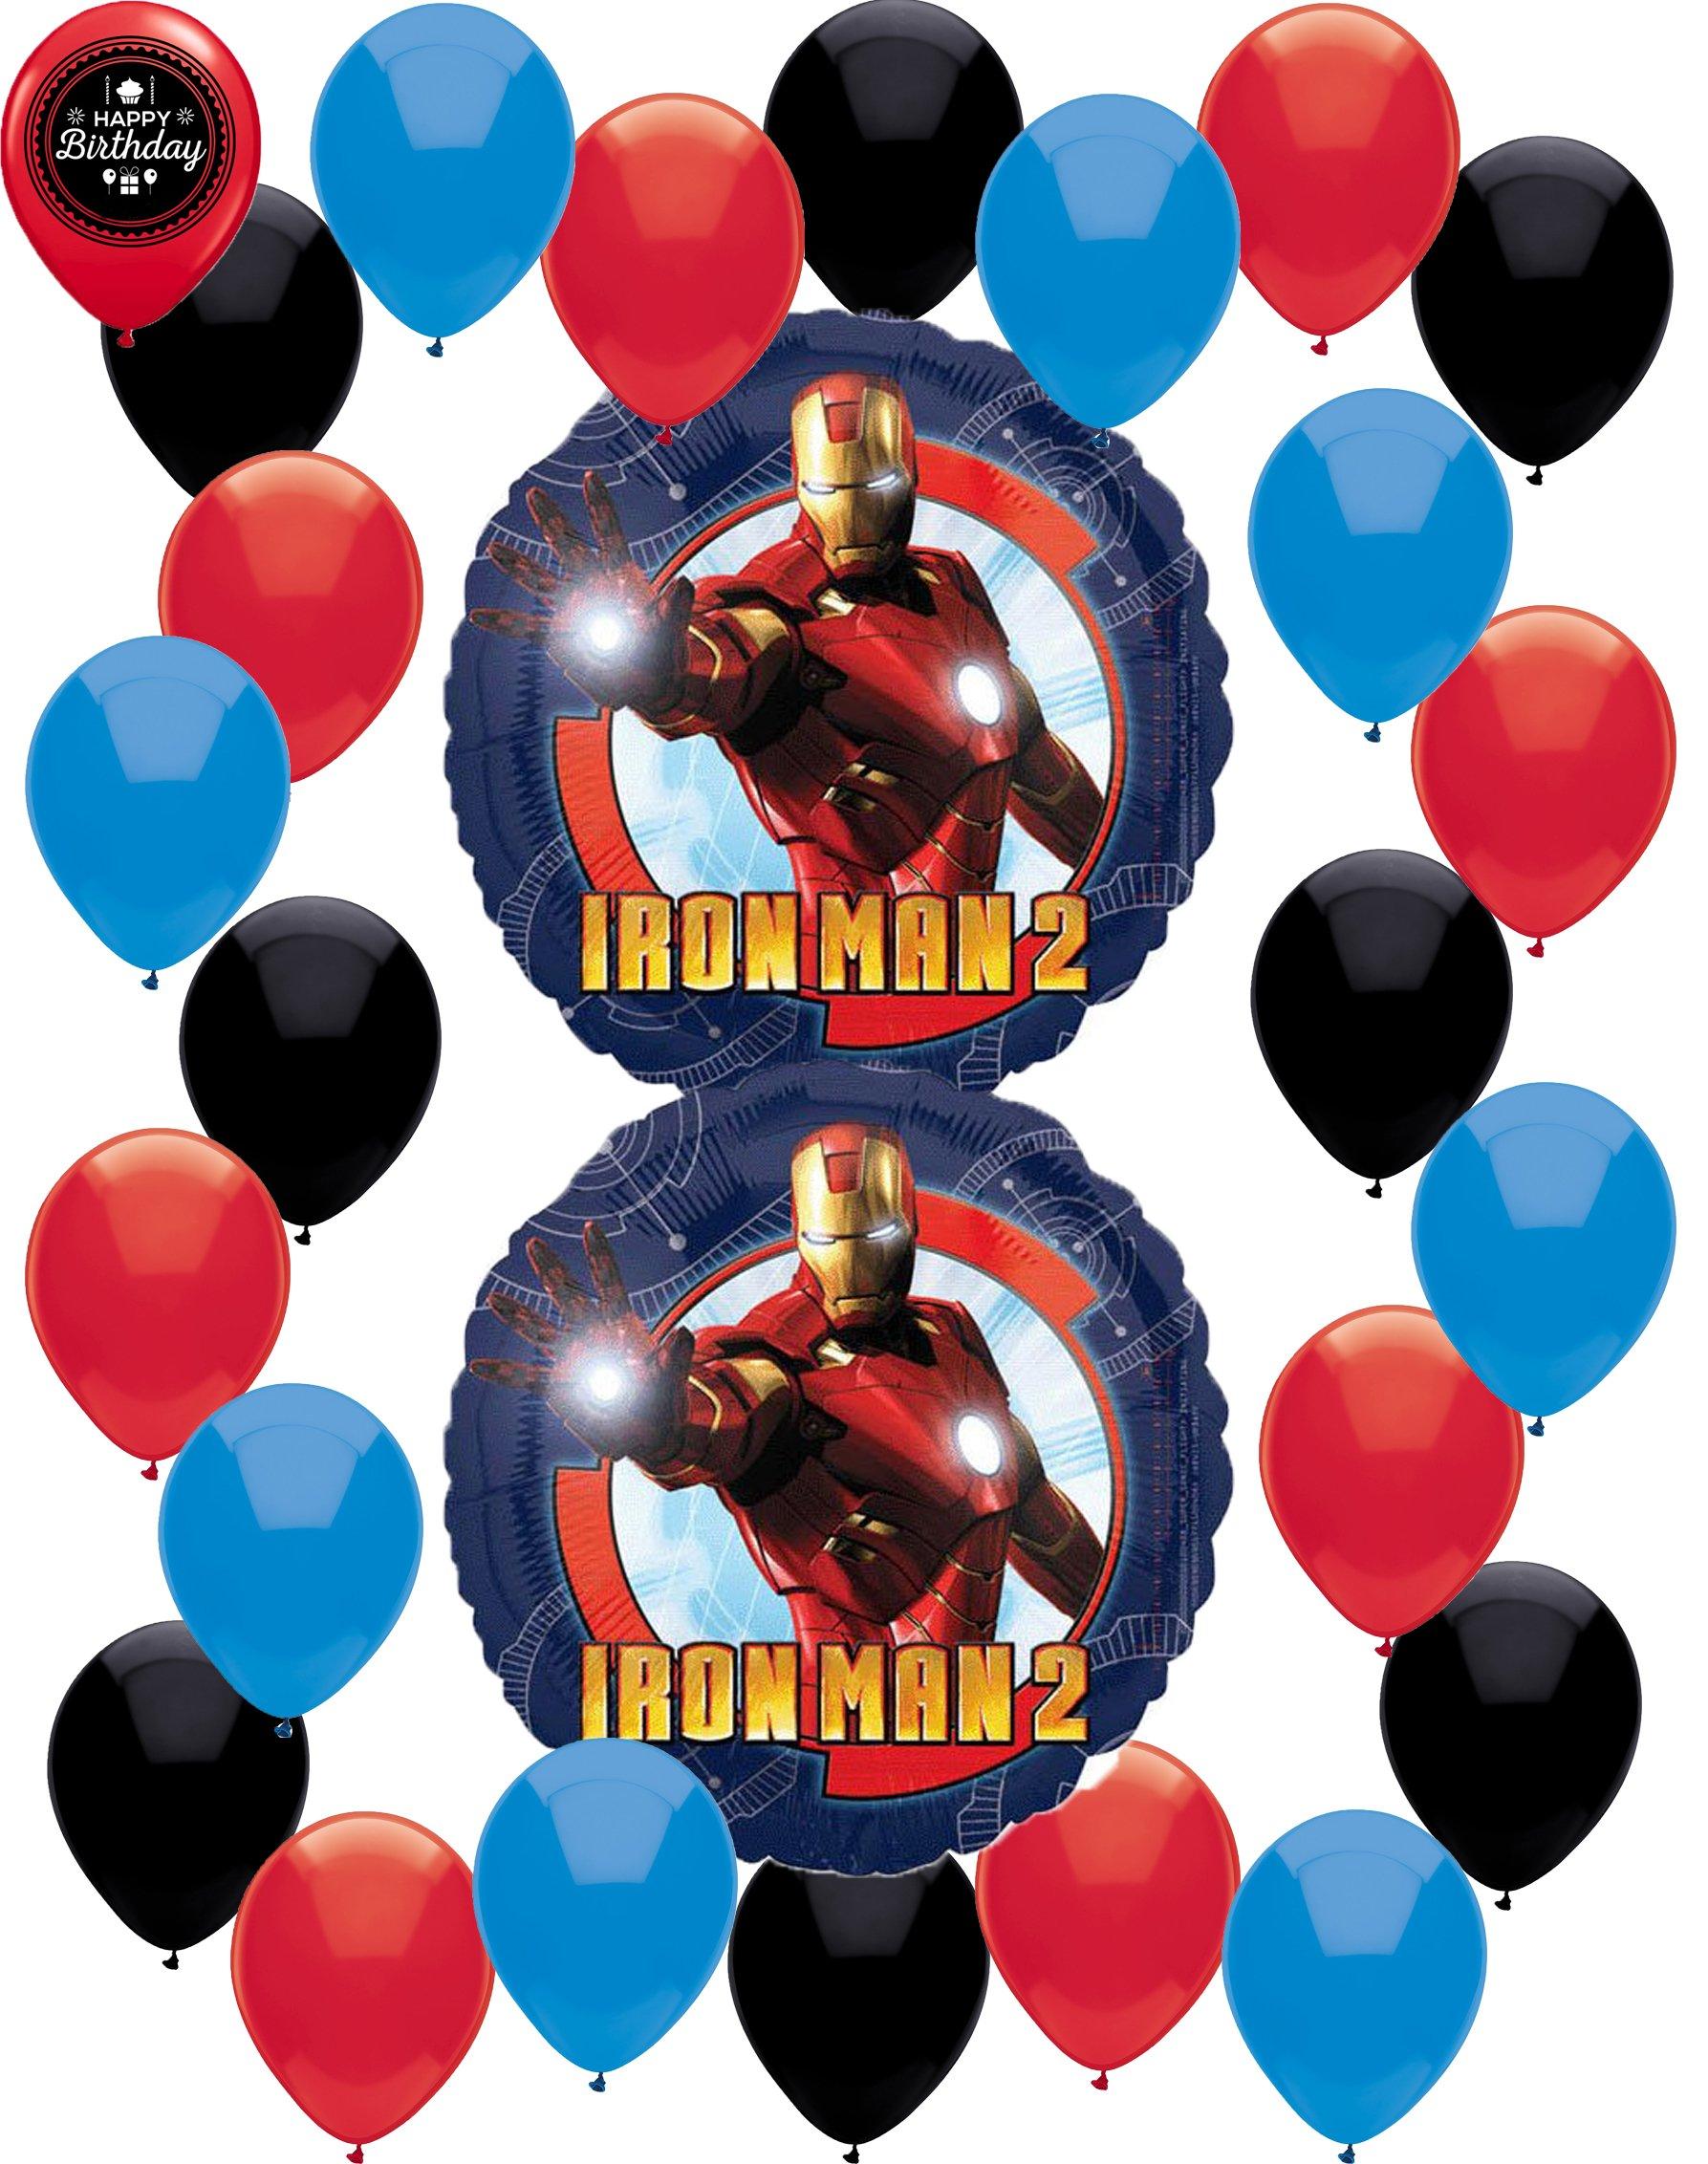 Iron Man 2 Balloon Decoration Bundle